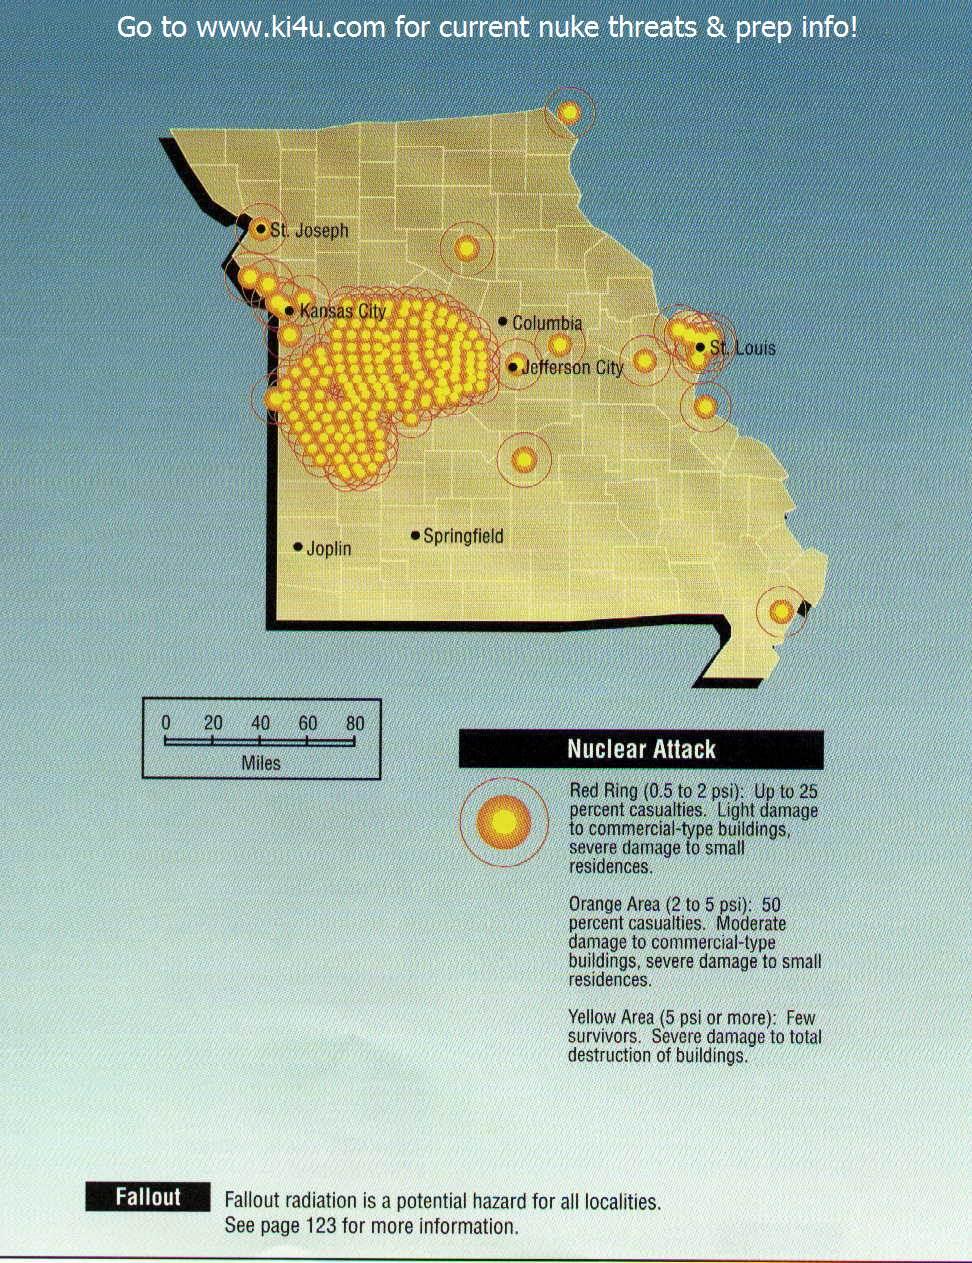 nuclear weapon target map for missouri fema 196september 1990 missouri targets